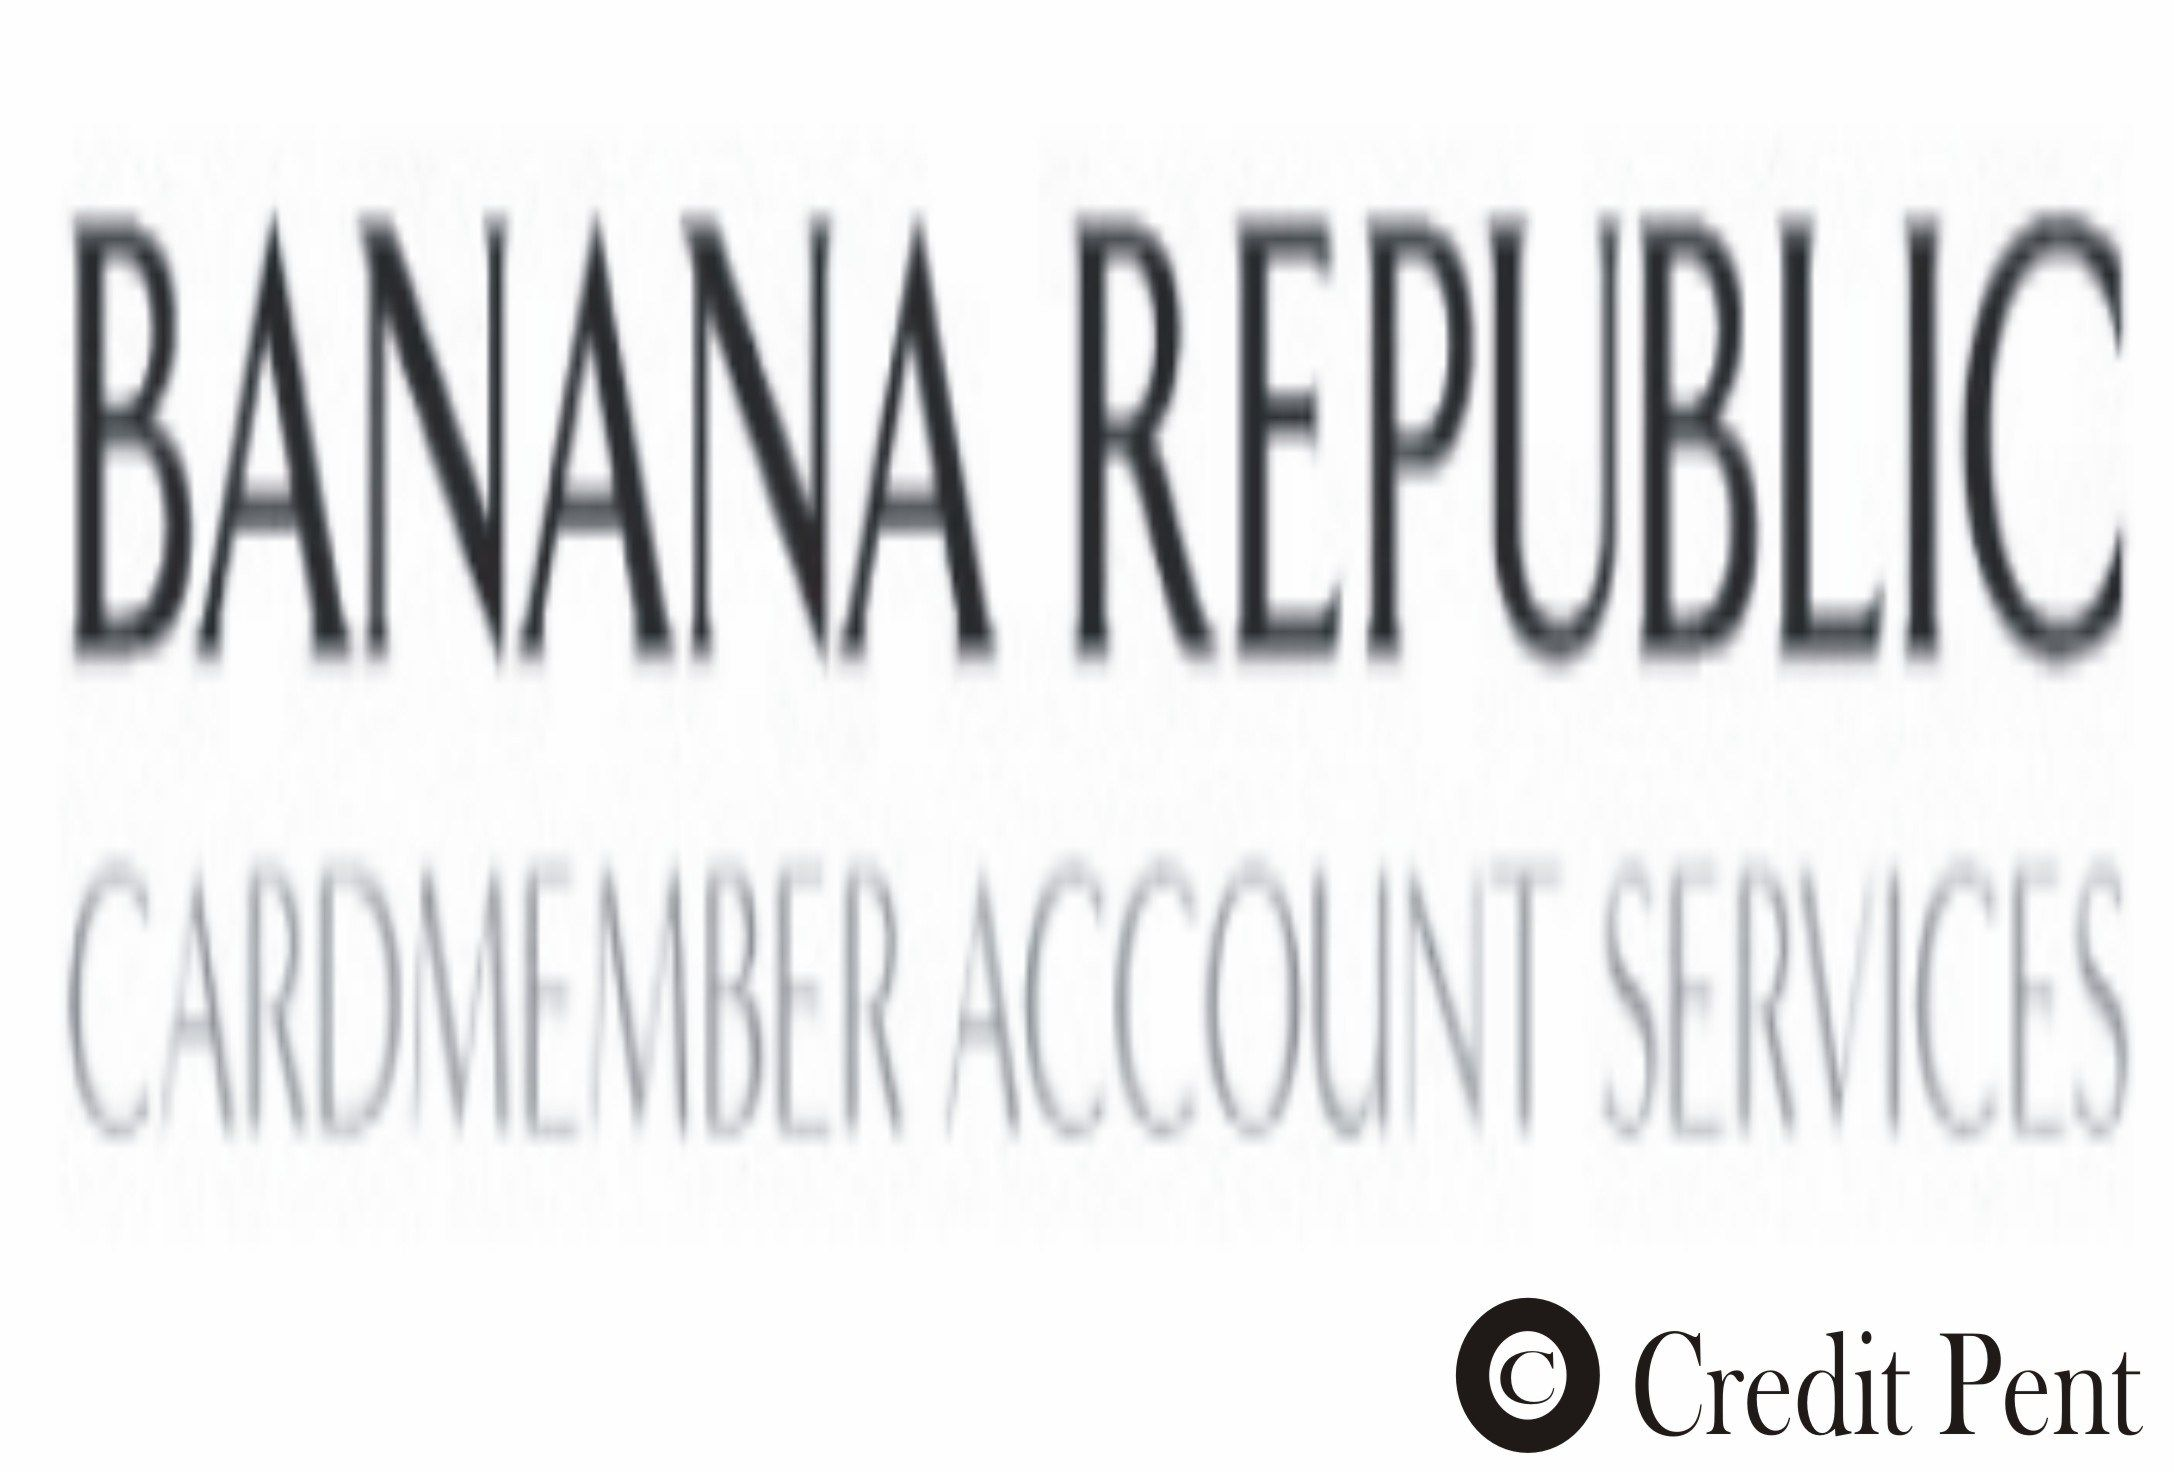 Banana republic credit card login rewards interest rate